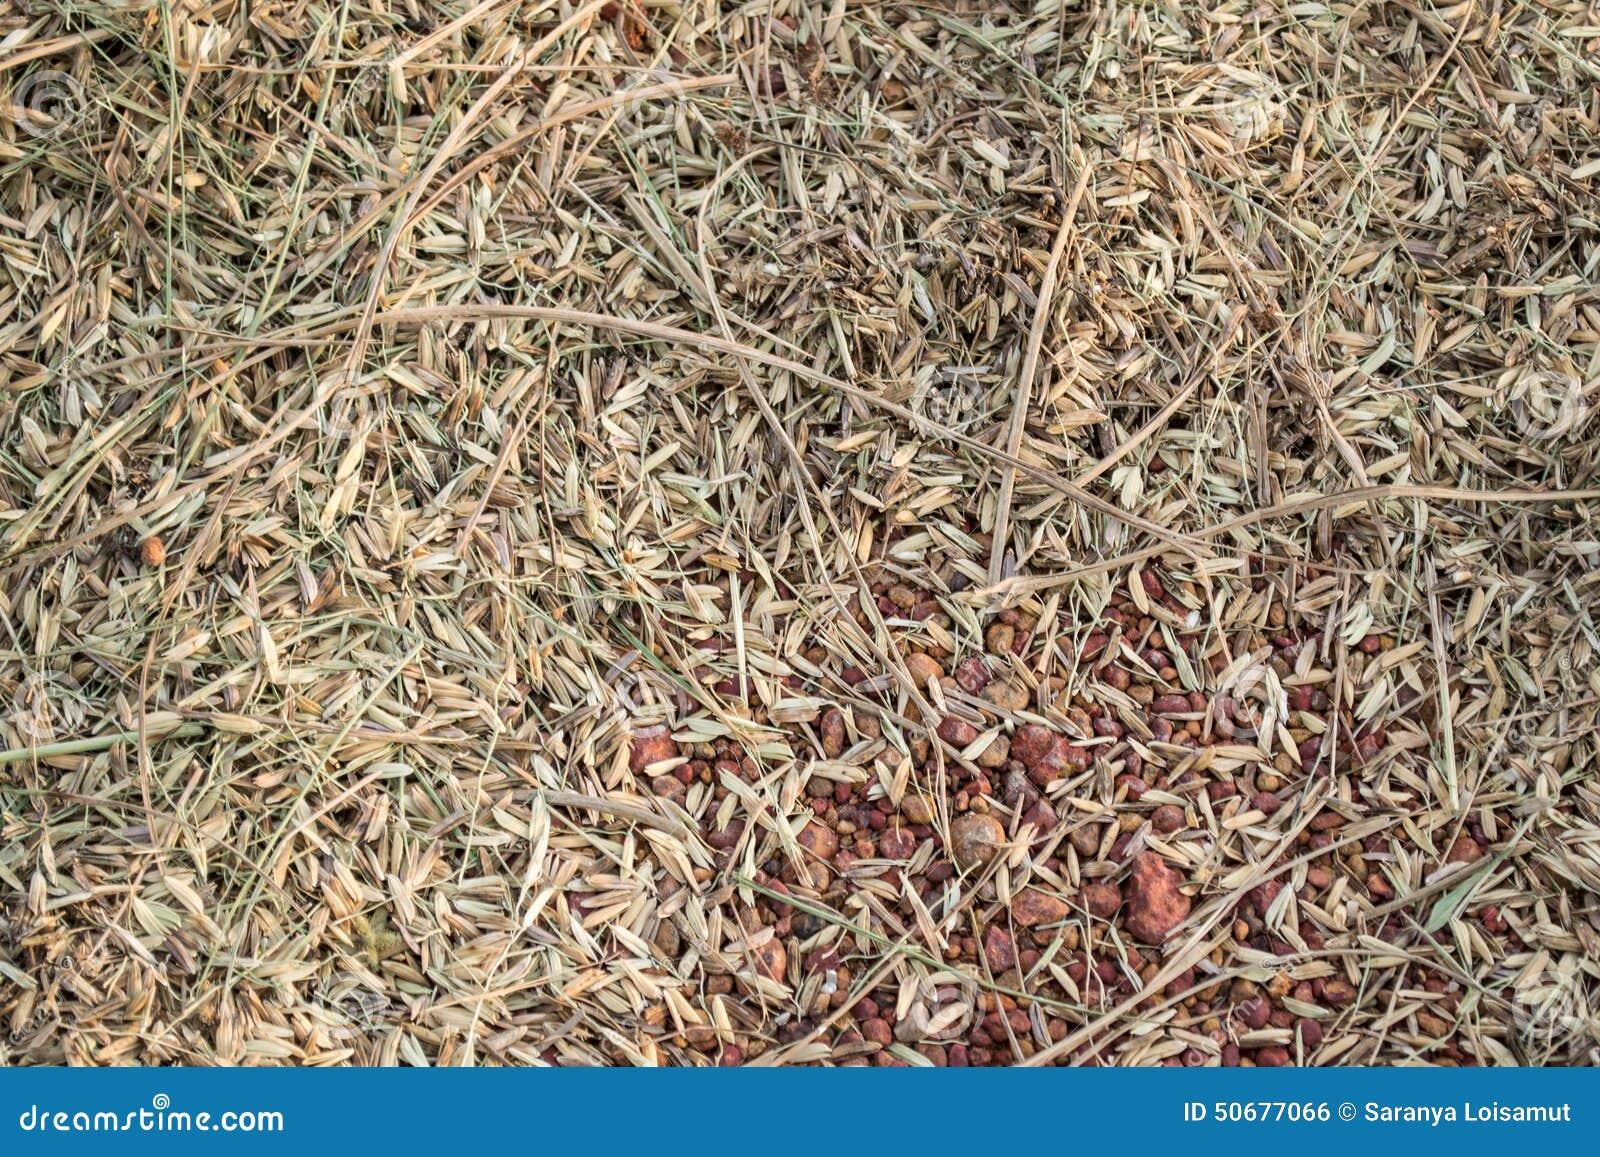 Download 在地板上的稻秸杆 库存照片. 图片 包括有 贫瘠, 乡下, 洪水, 种田, 背包, 住宅, 痛苦, 甚而 - 50677066